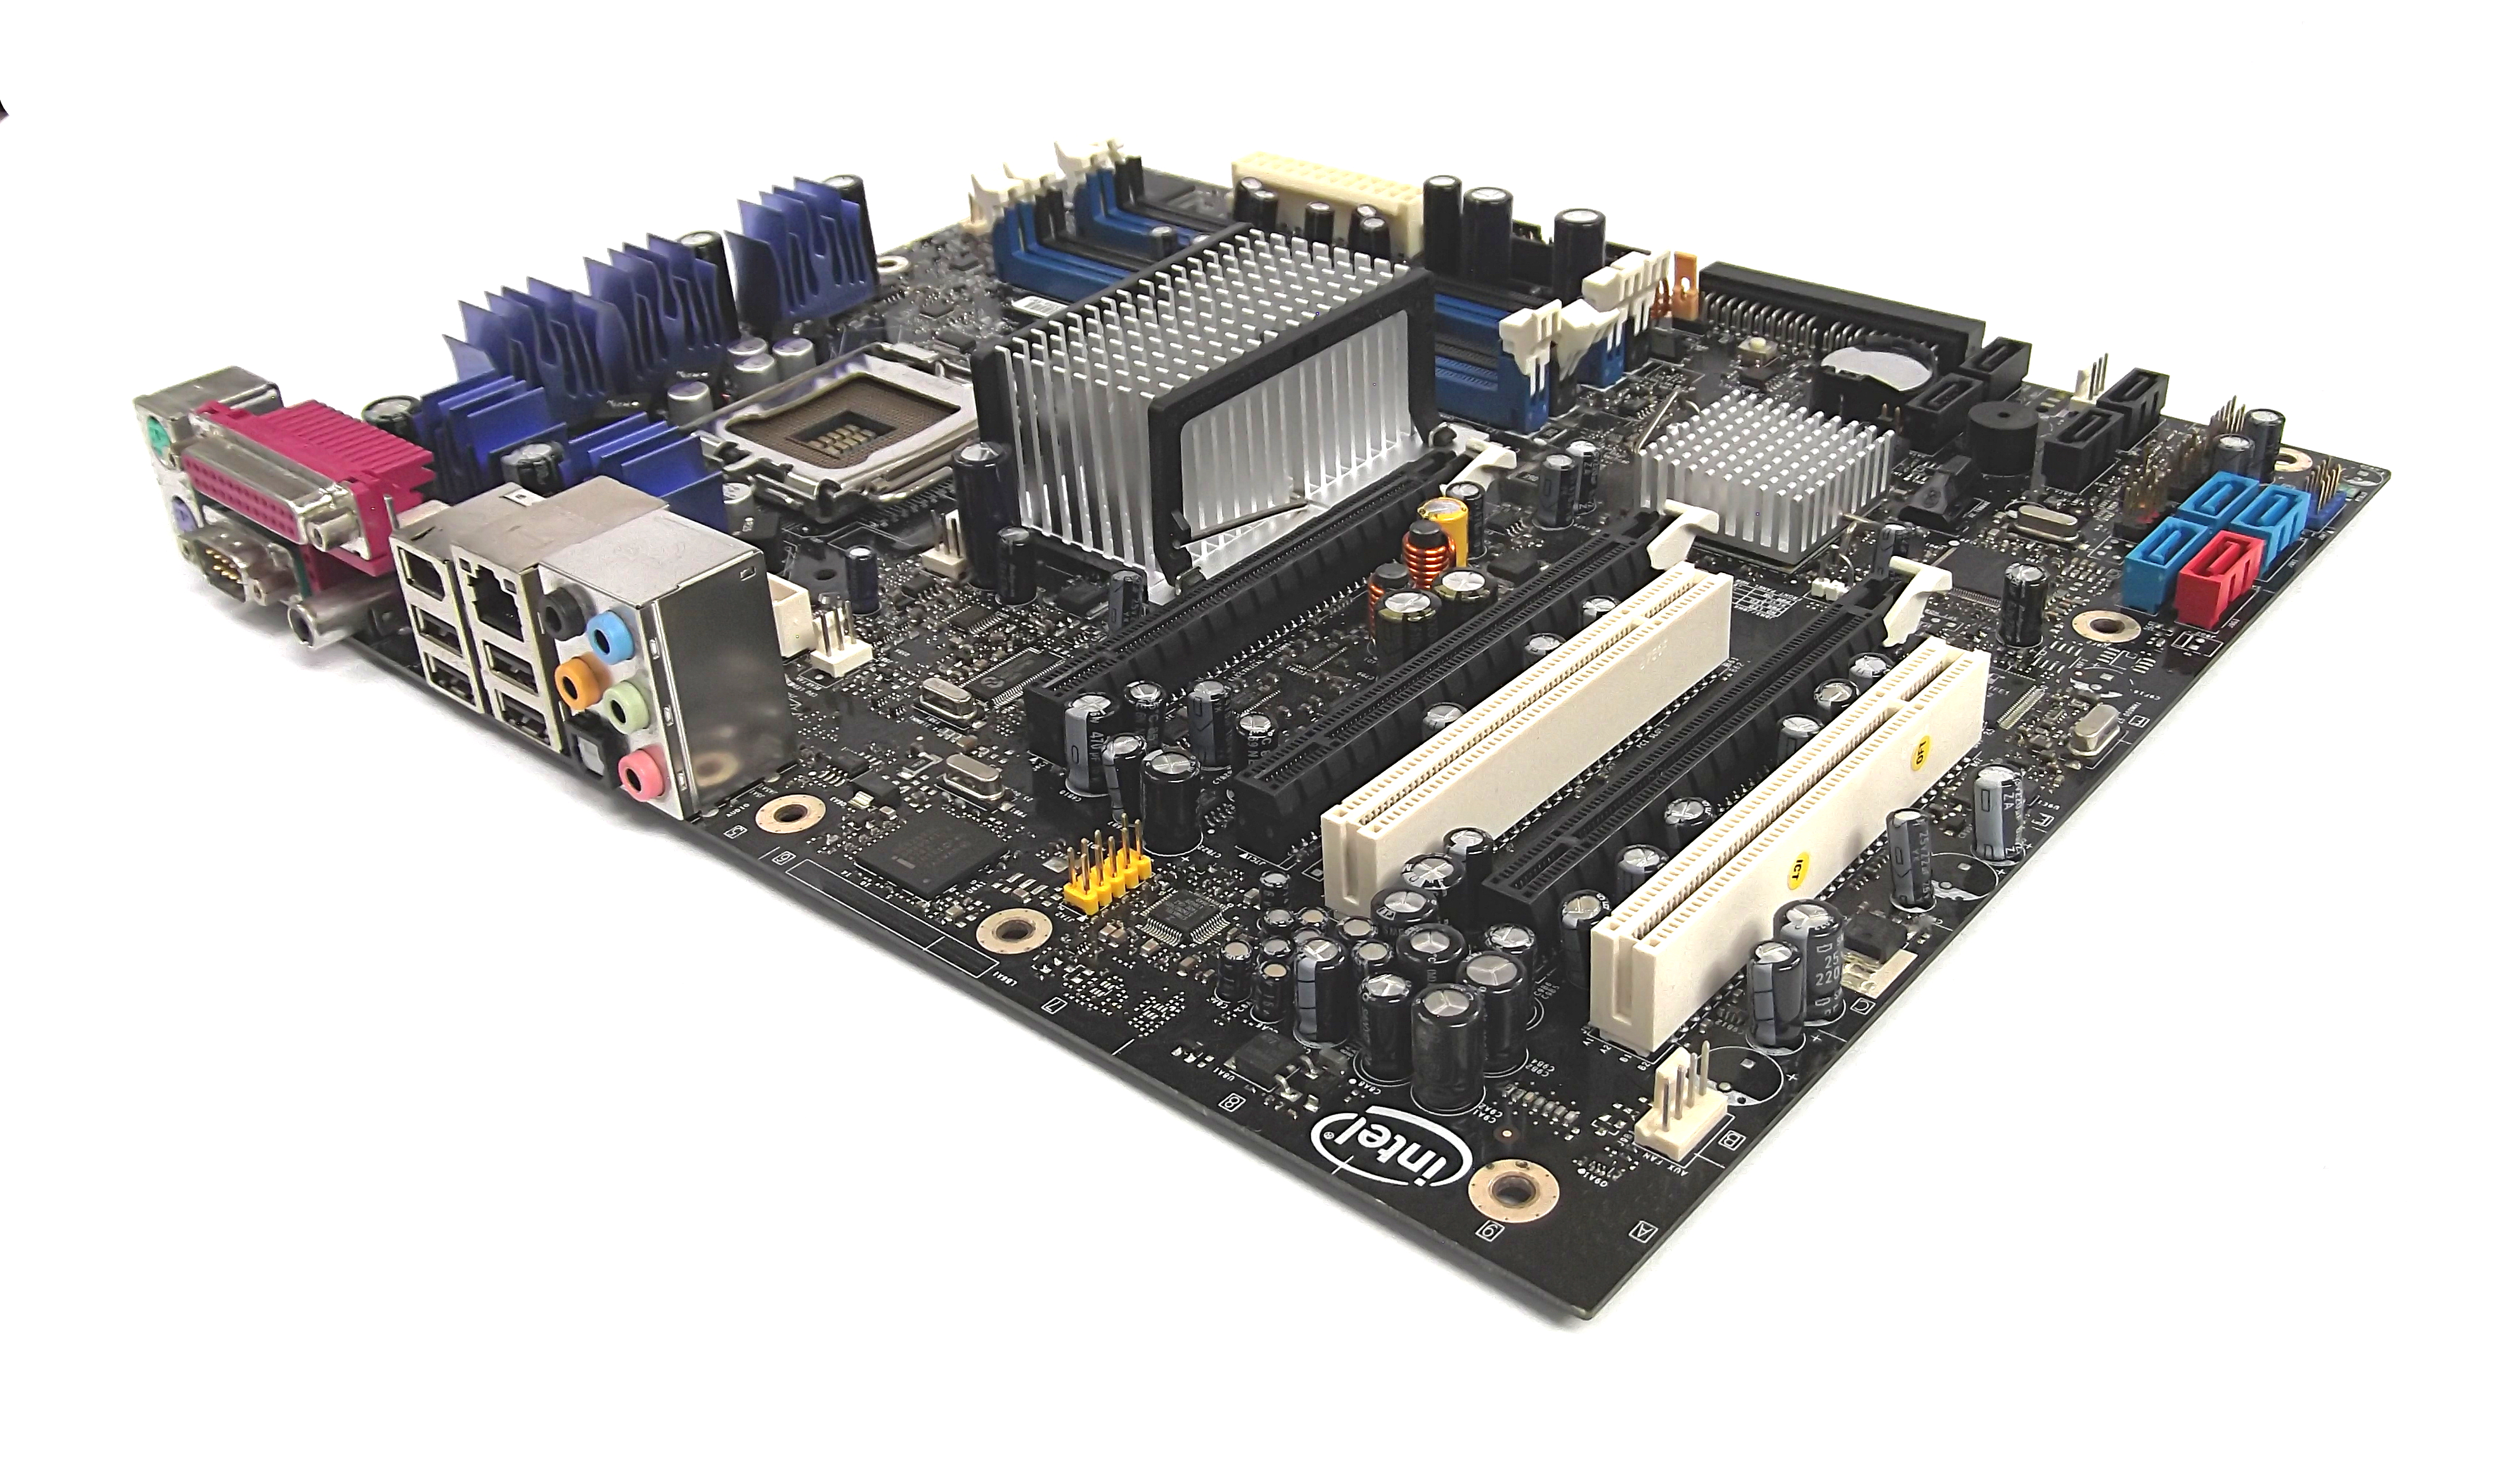 Intel D53350-505 Socket LGA775 Motherboard - D975XBX2KR